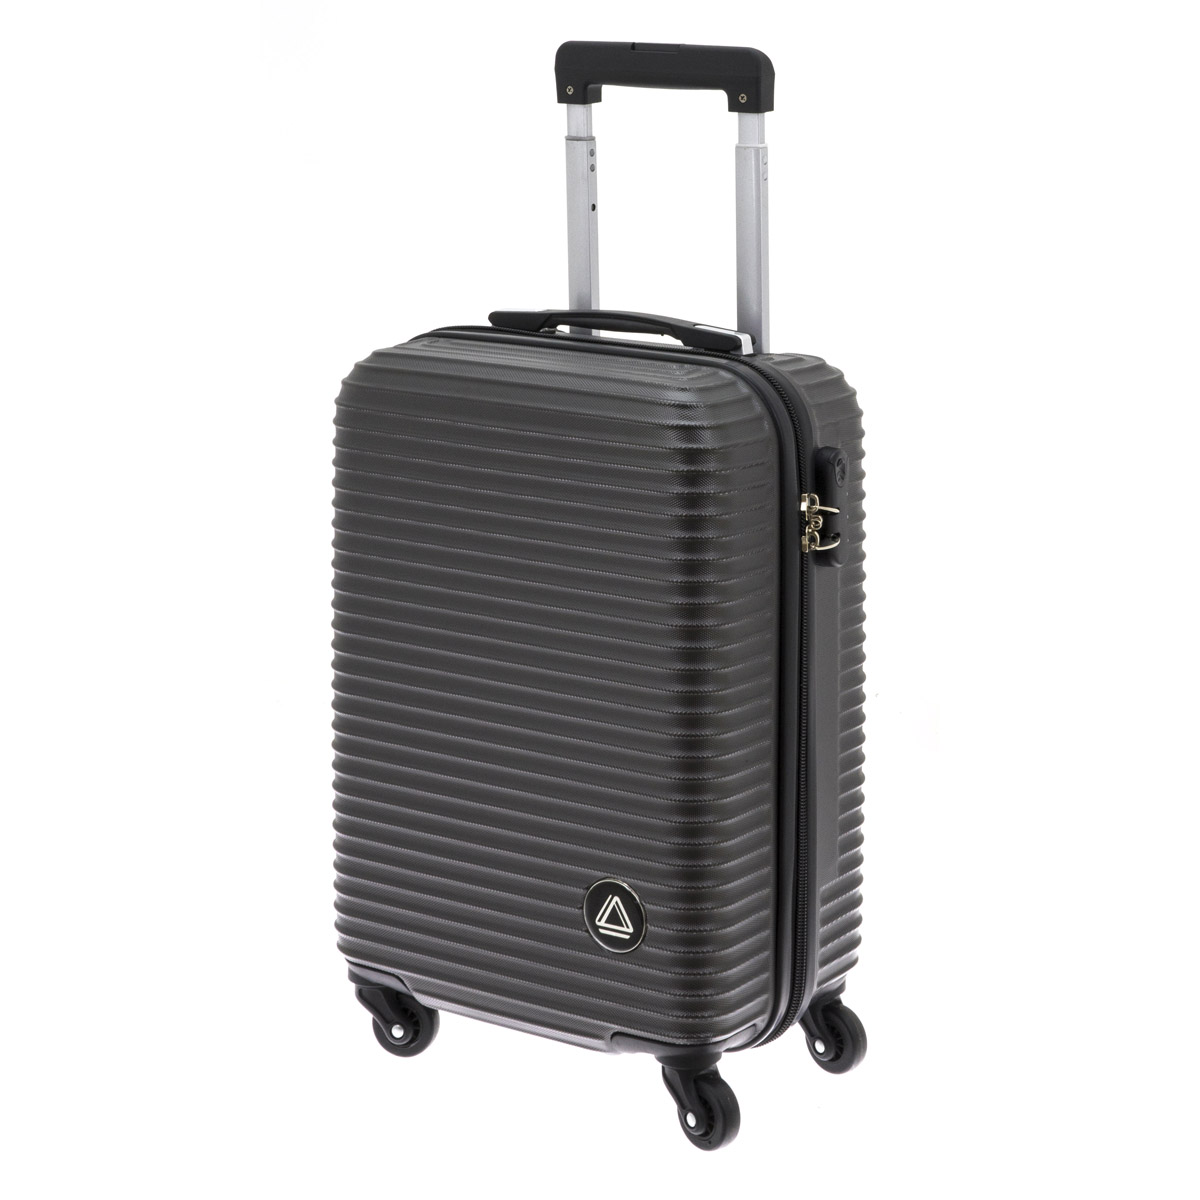 Valise trolley coque ABS \'Davidt\'s\' gris anthracite (format cabine) - 55x38x20 cm - [Q9936]